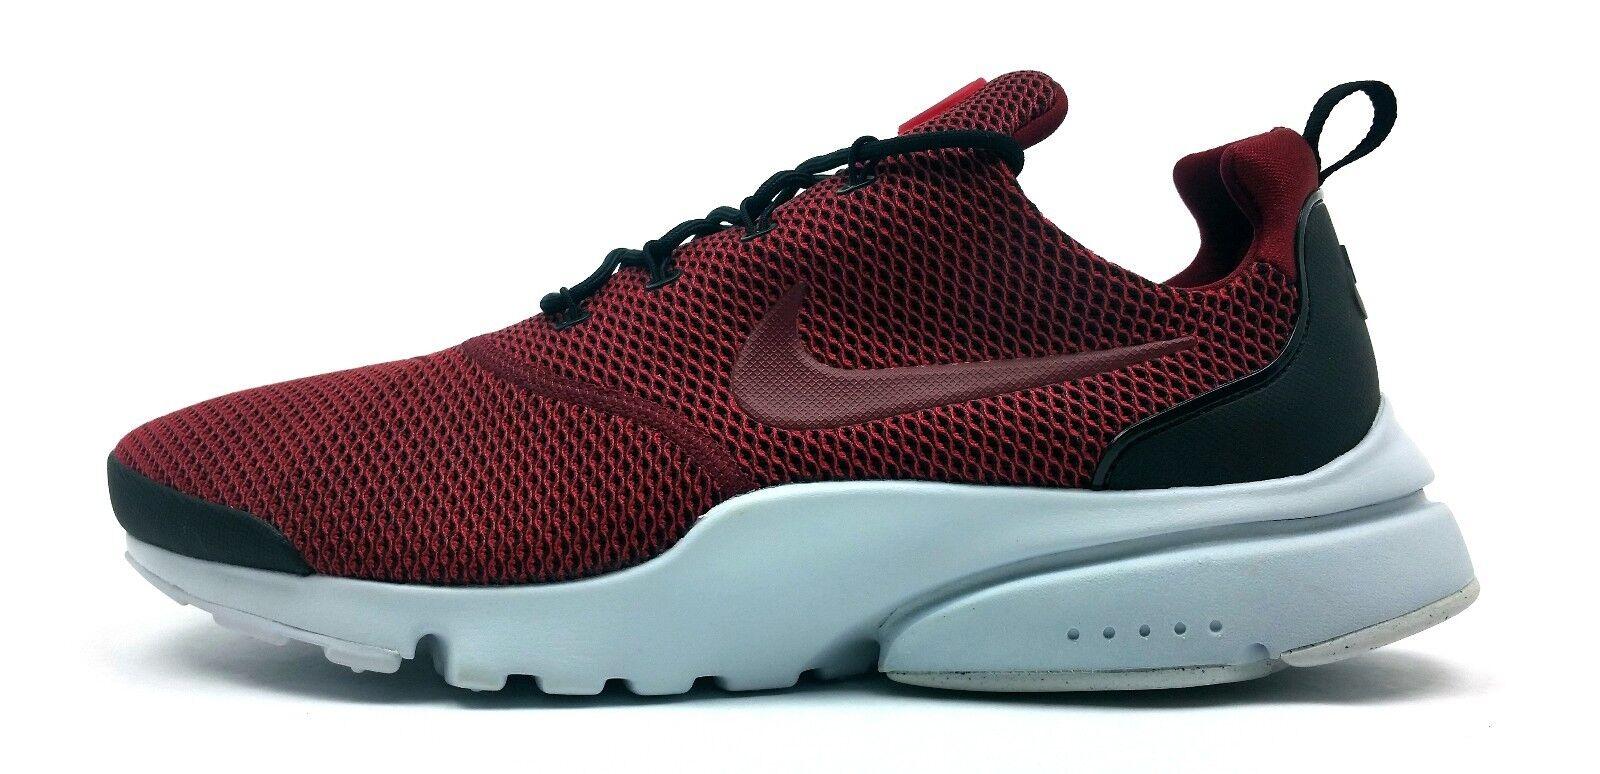 Nike Presto Fly SE NEW Men's Running shoes Black Team Red Run Jog